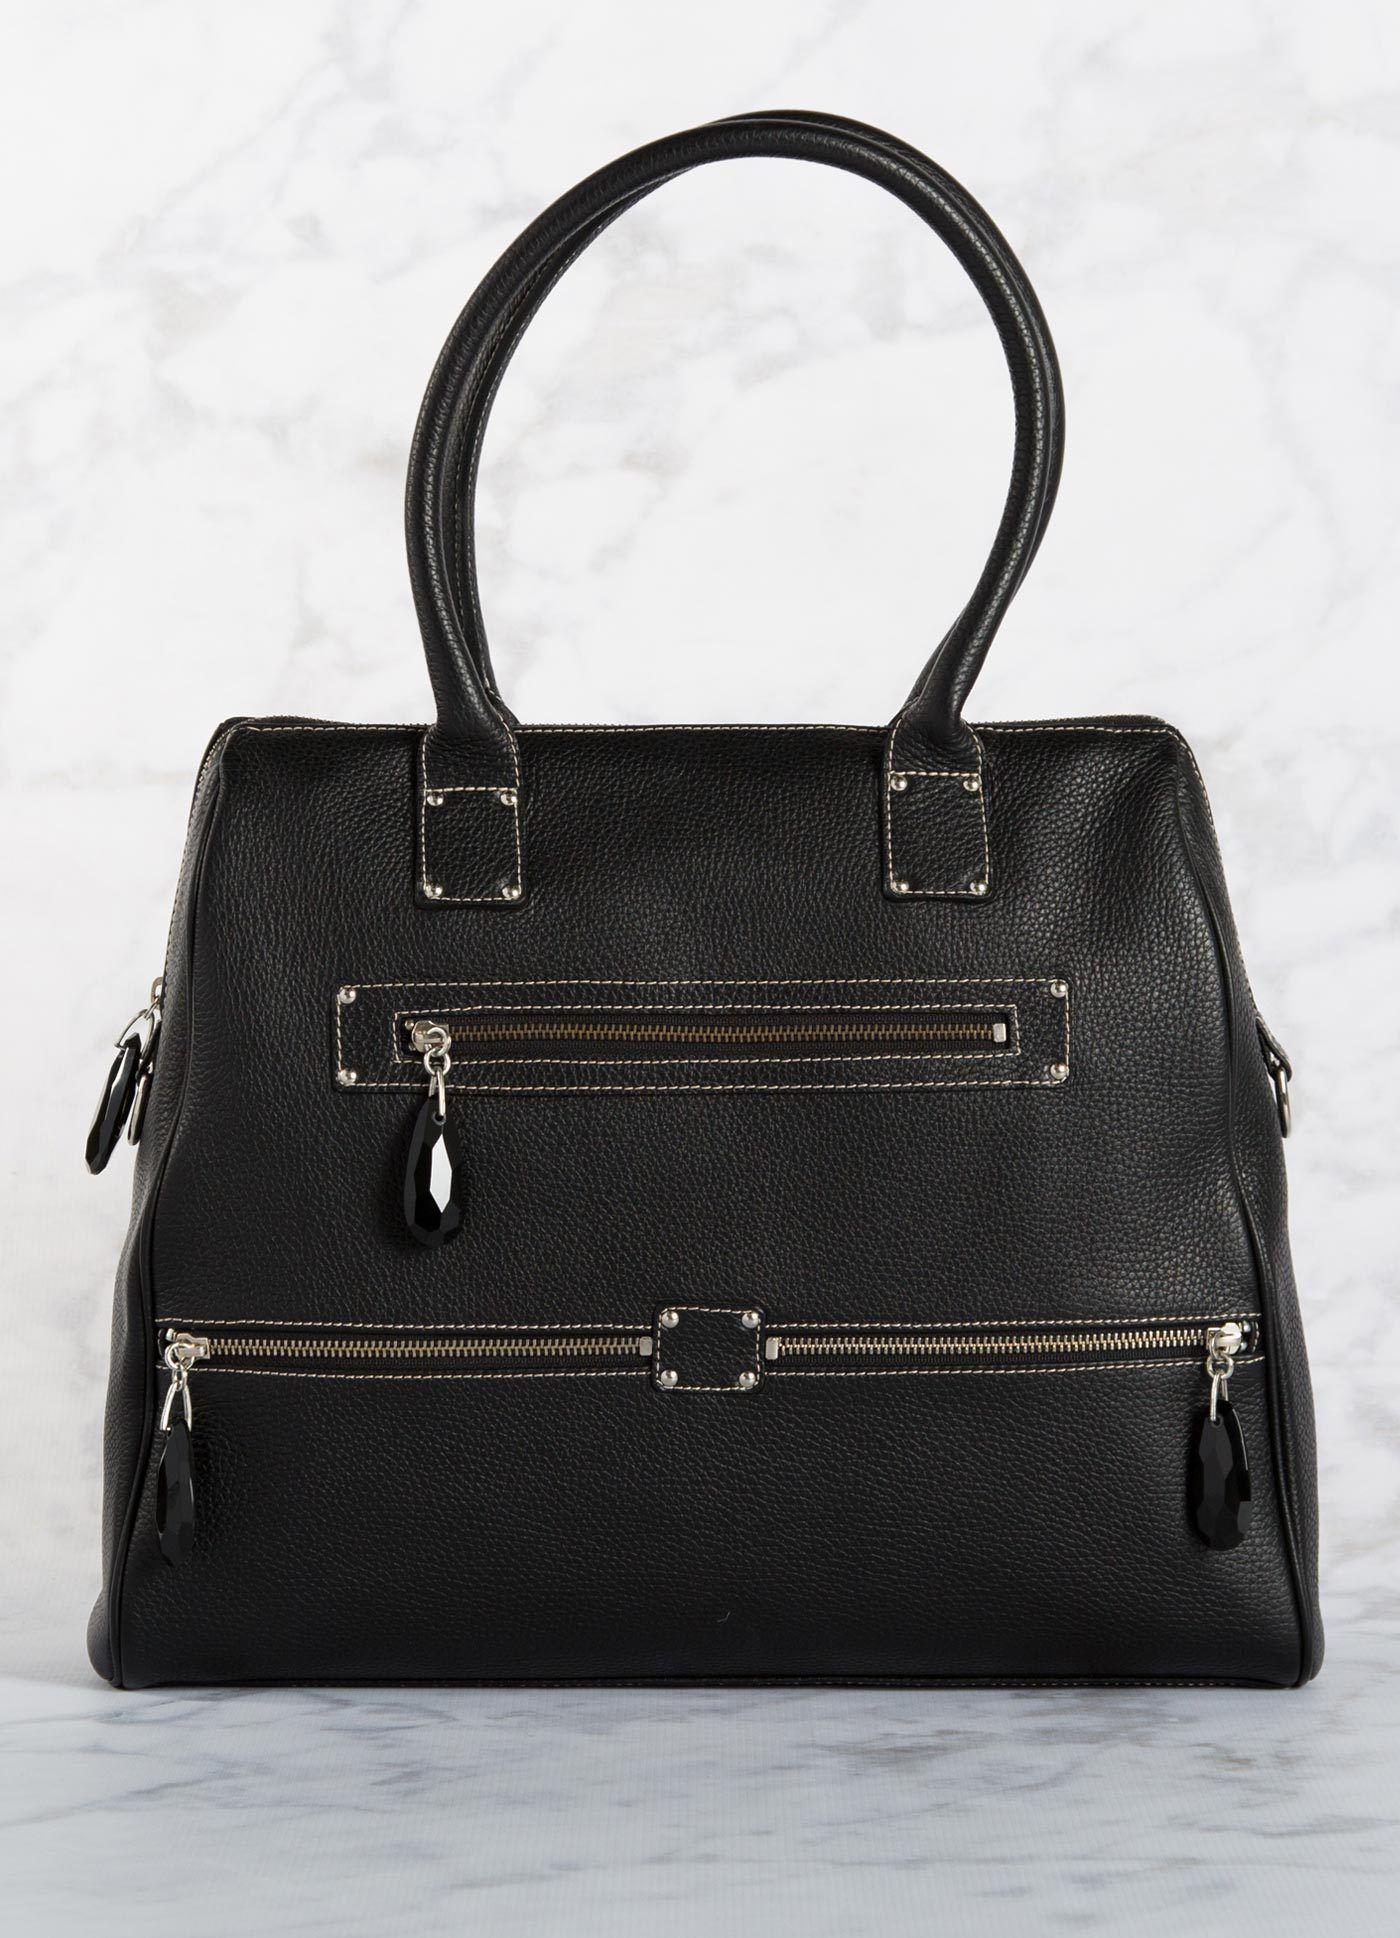 Boston Tote, Black Leather